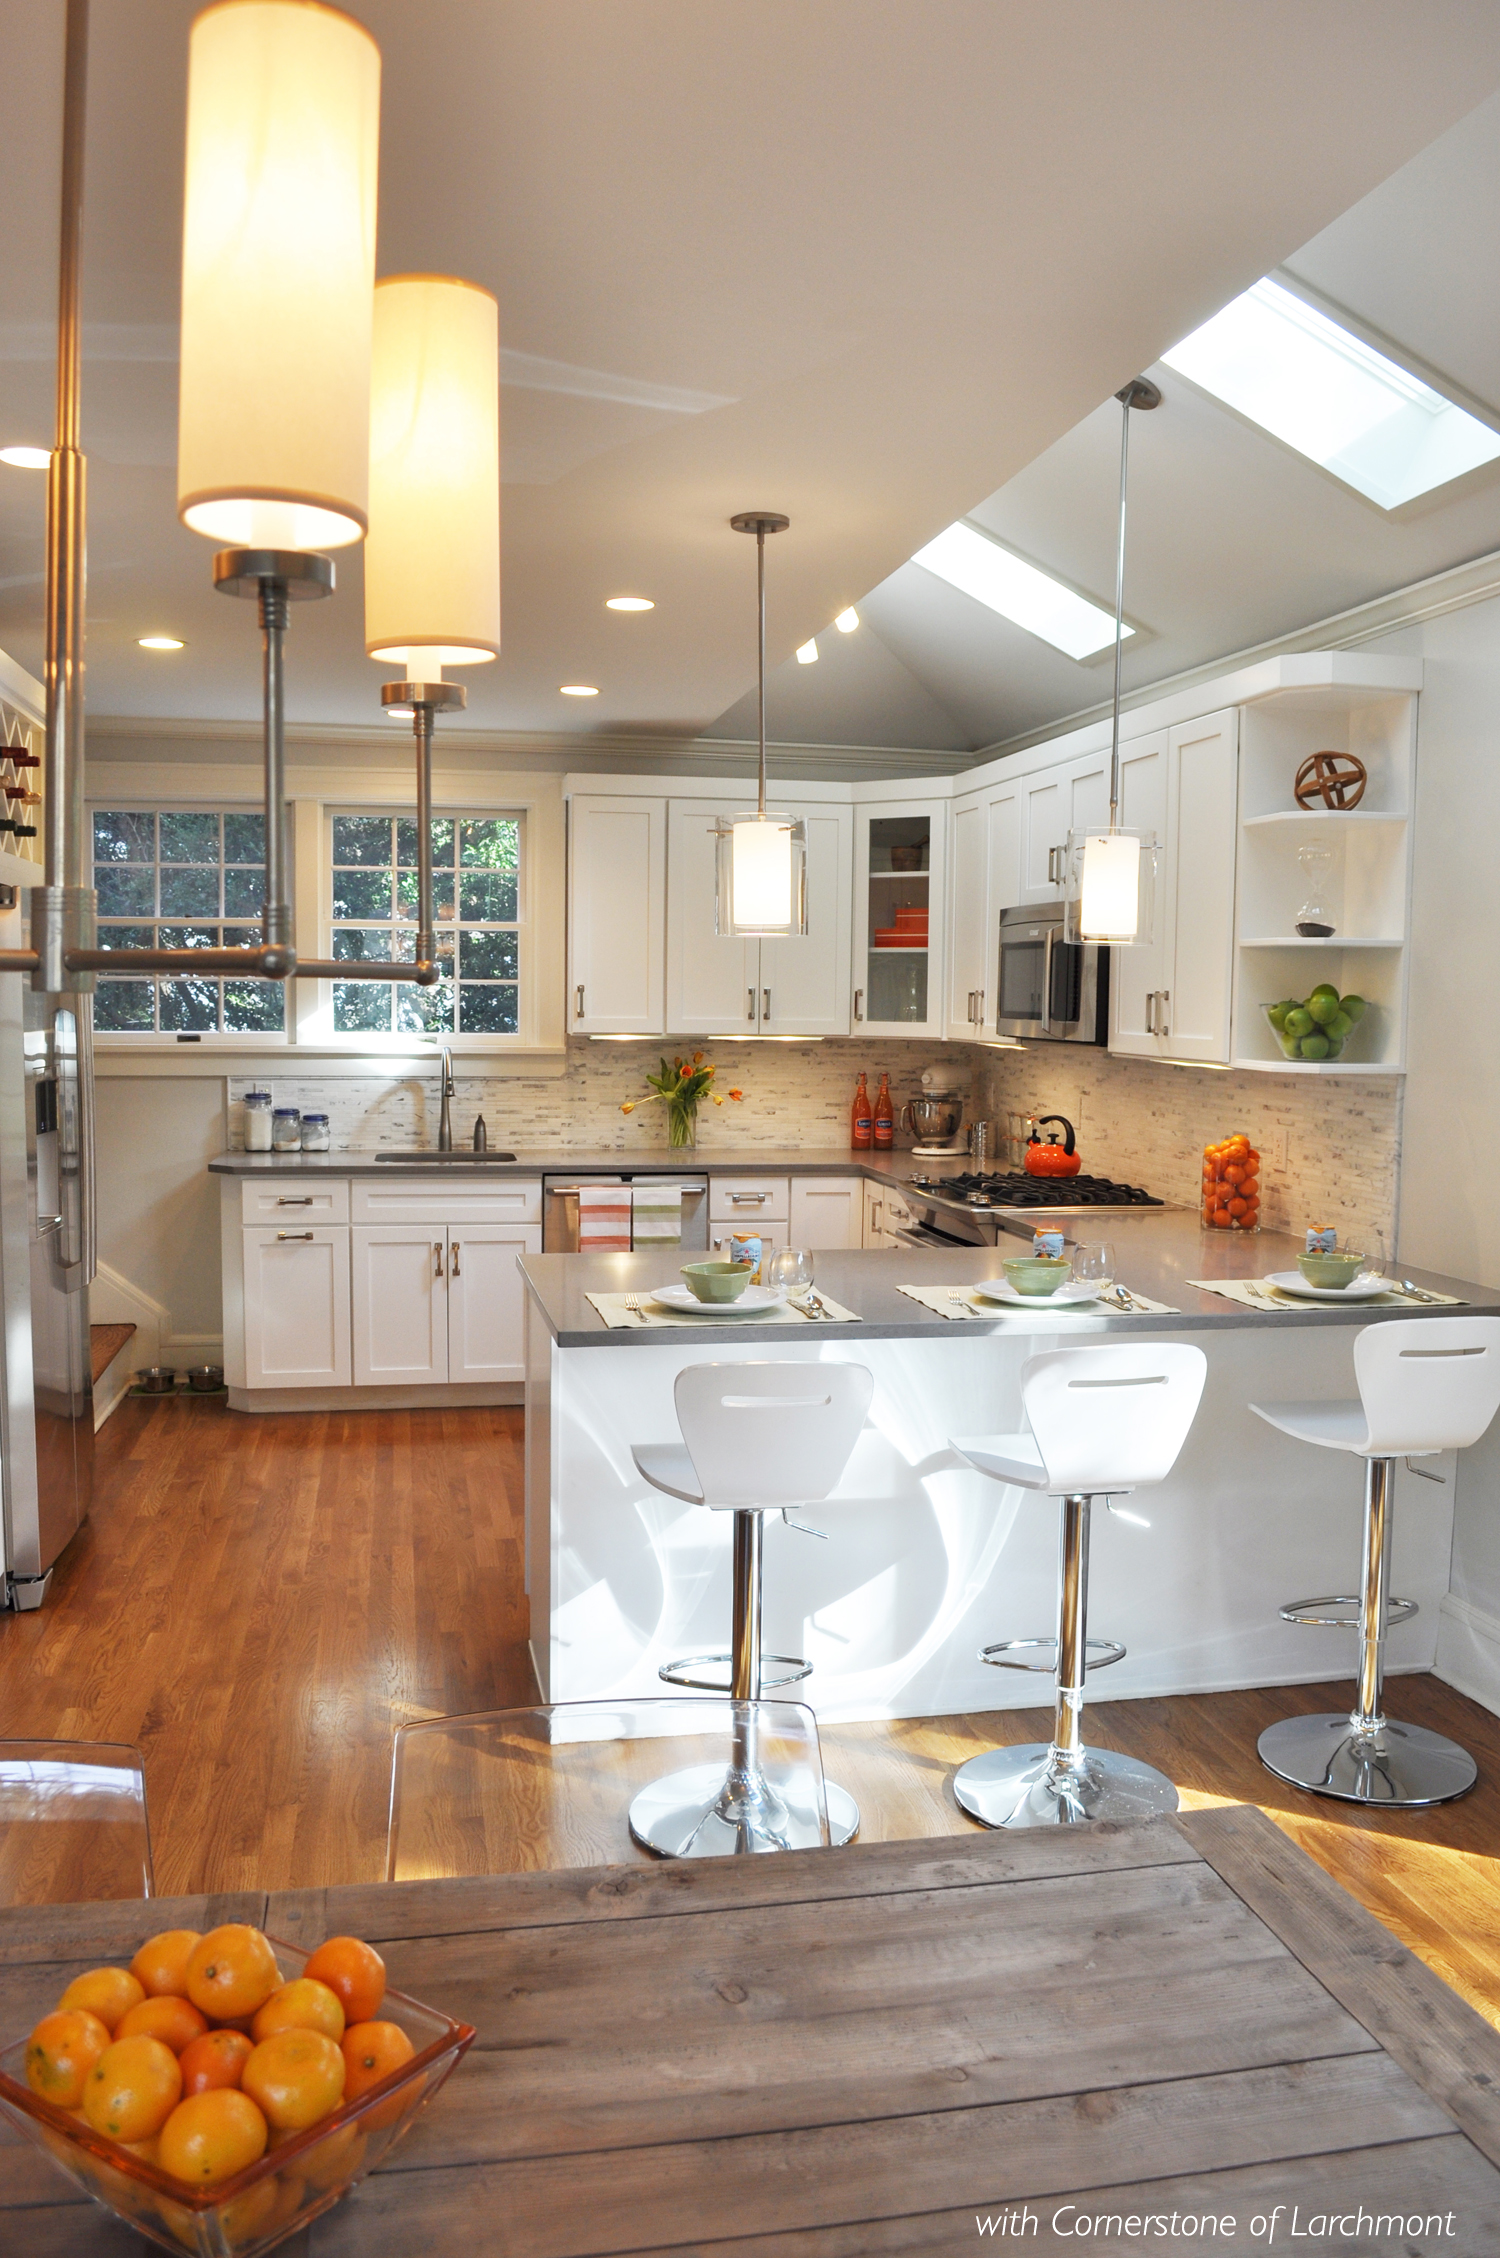 KAM DESIGN LLC_Kitchen Remodel_White Kitchen Cabinets_Caesarstone counters_Carrara Backsplash_Modern Lighting.jpg